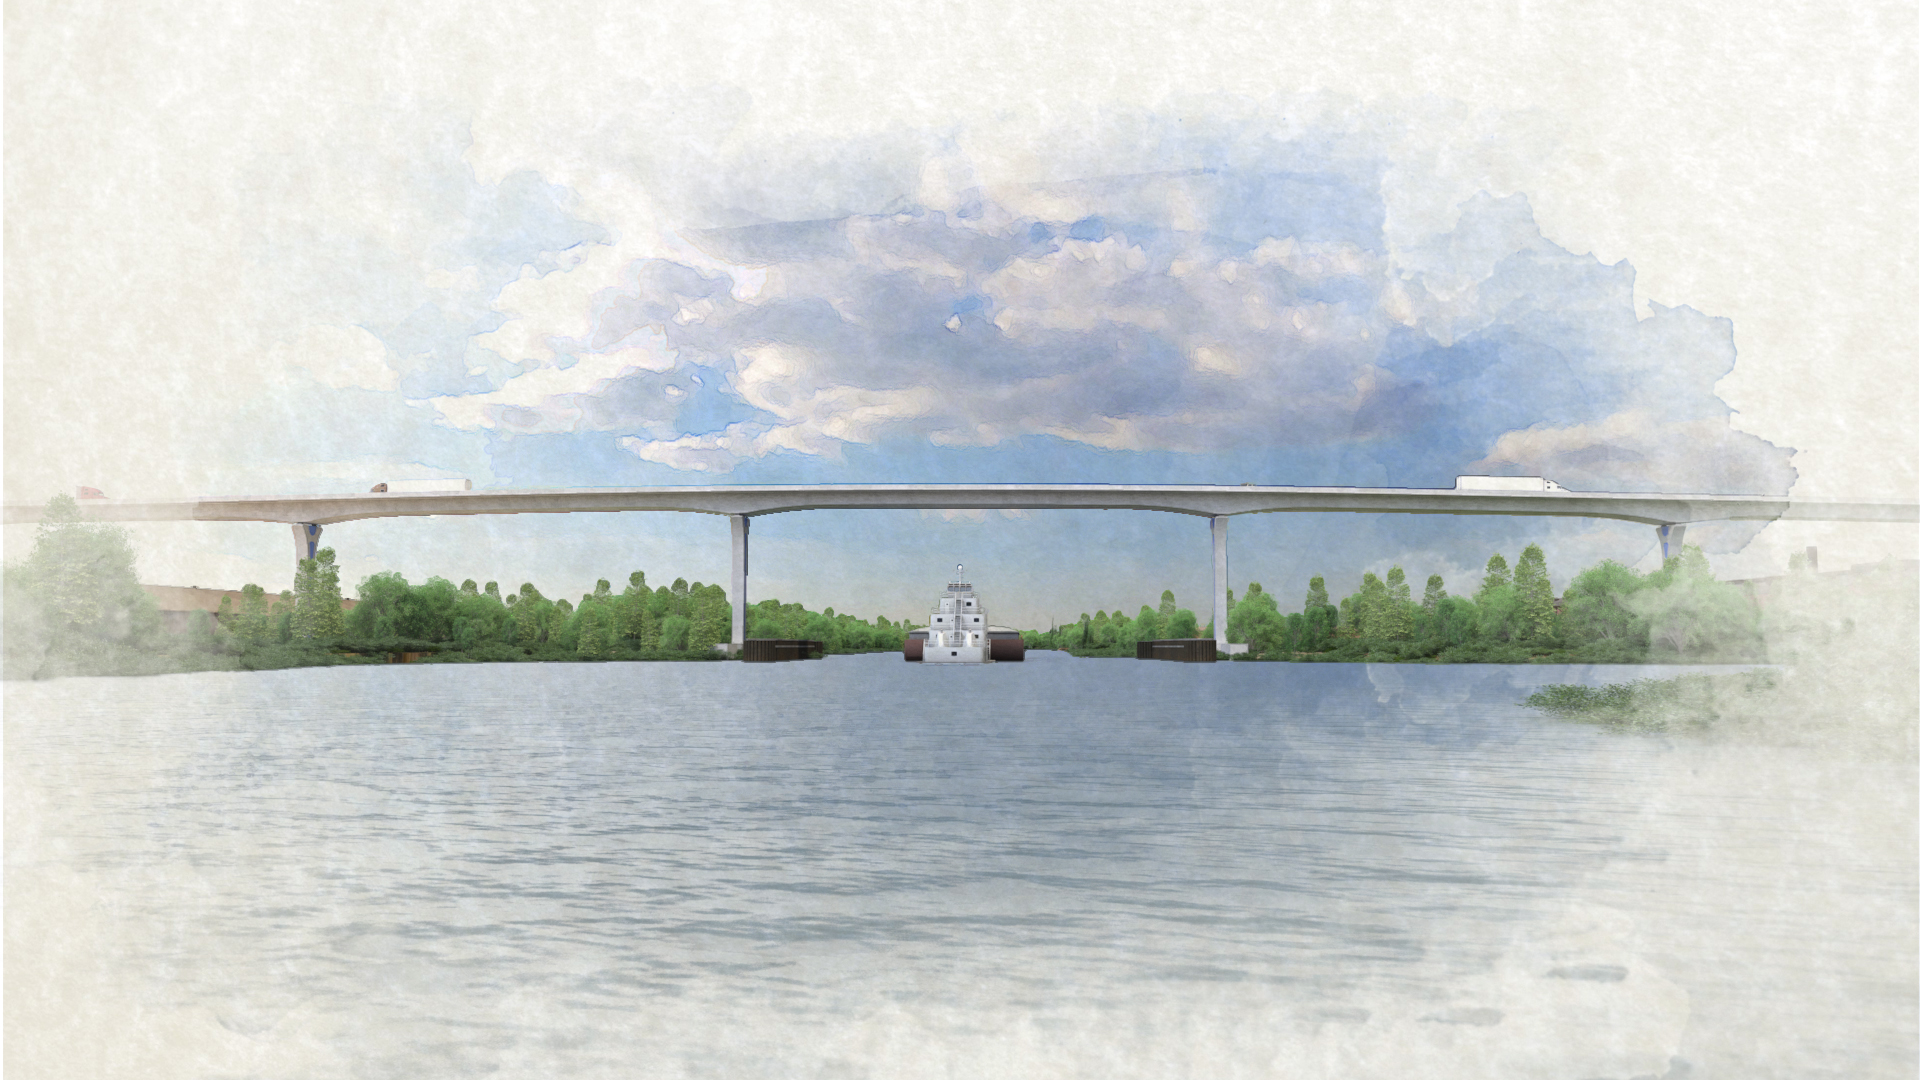 Cline Avenue Bridge – View 5